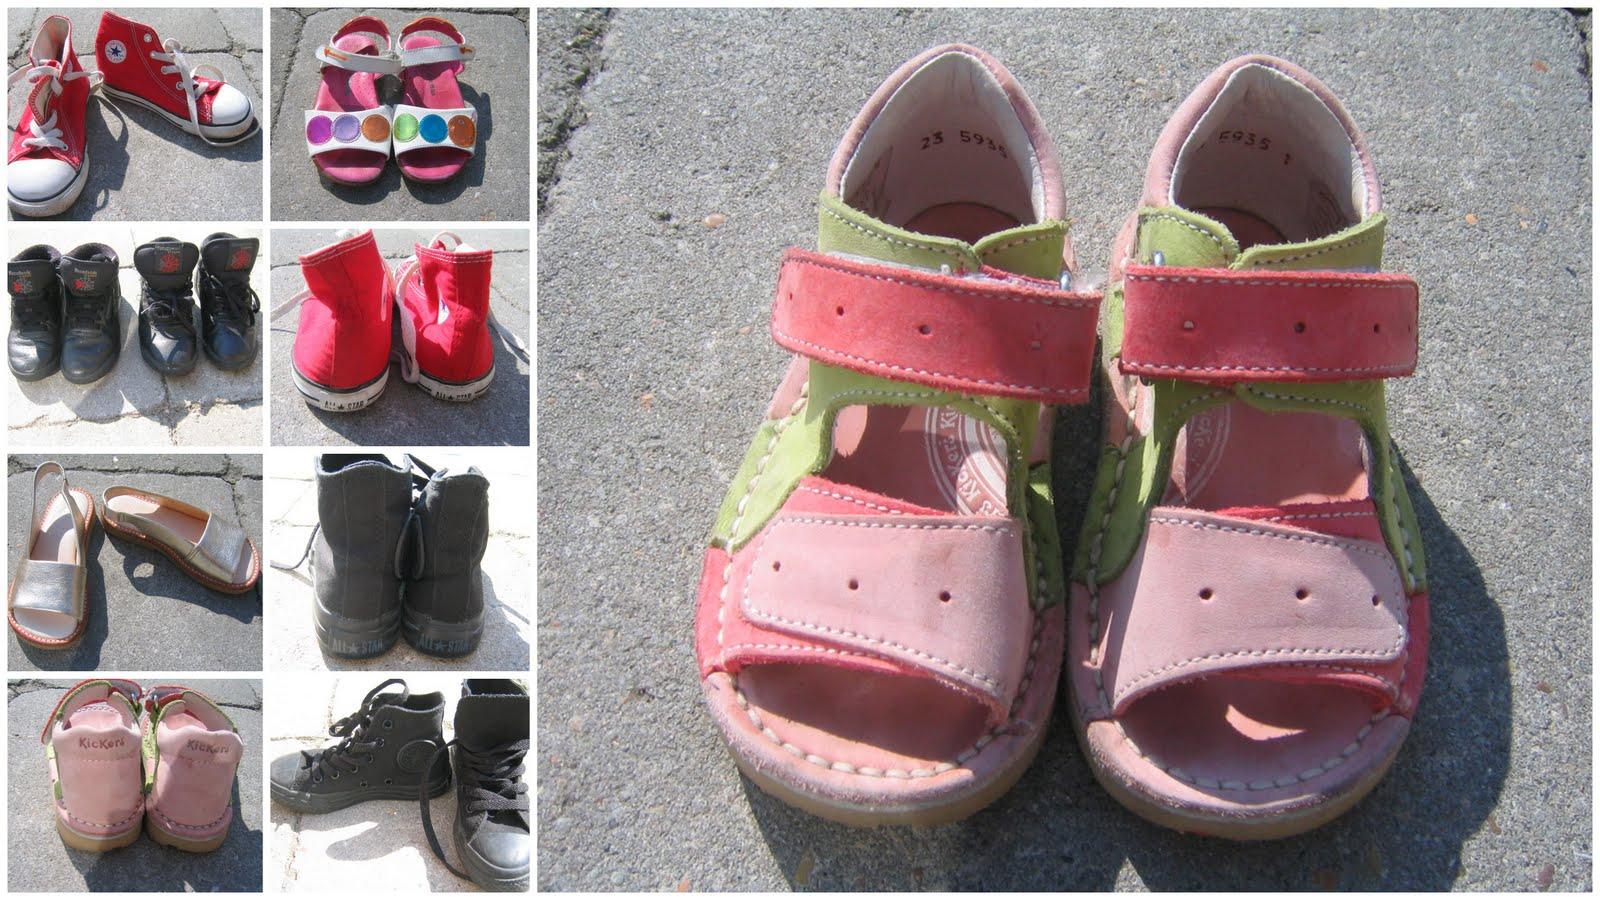 5beb215c67c Røde CONVERSE str 25 (15,5 cm) 150 kr. Sorte CONVERSE str 28 (17 cm) 150  kr. KICKERS sandaler str 23 (14 cm) 15o kr. AGATHA RUIZ PRADA sandaler m  kålorm str ...